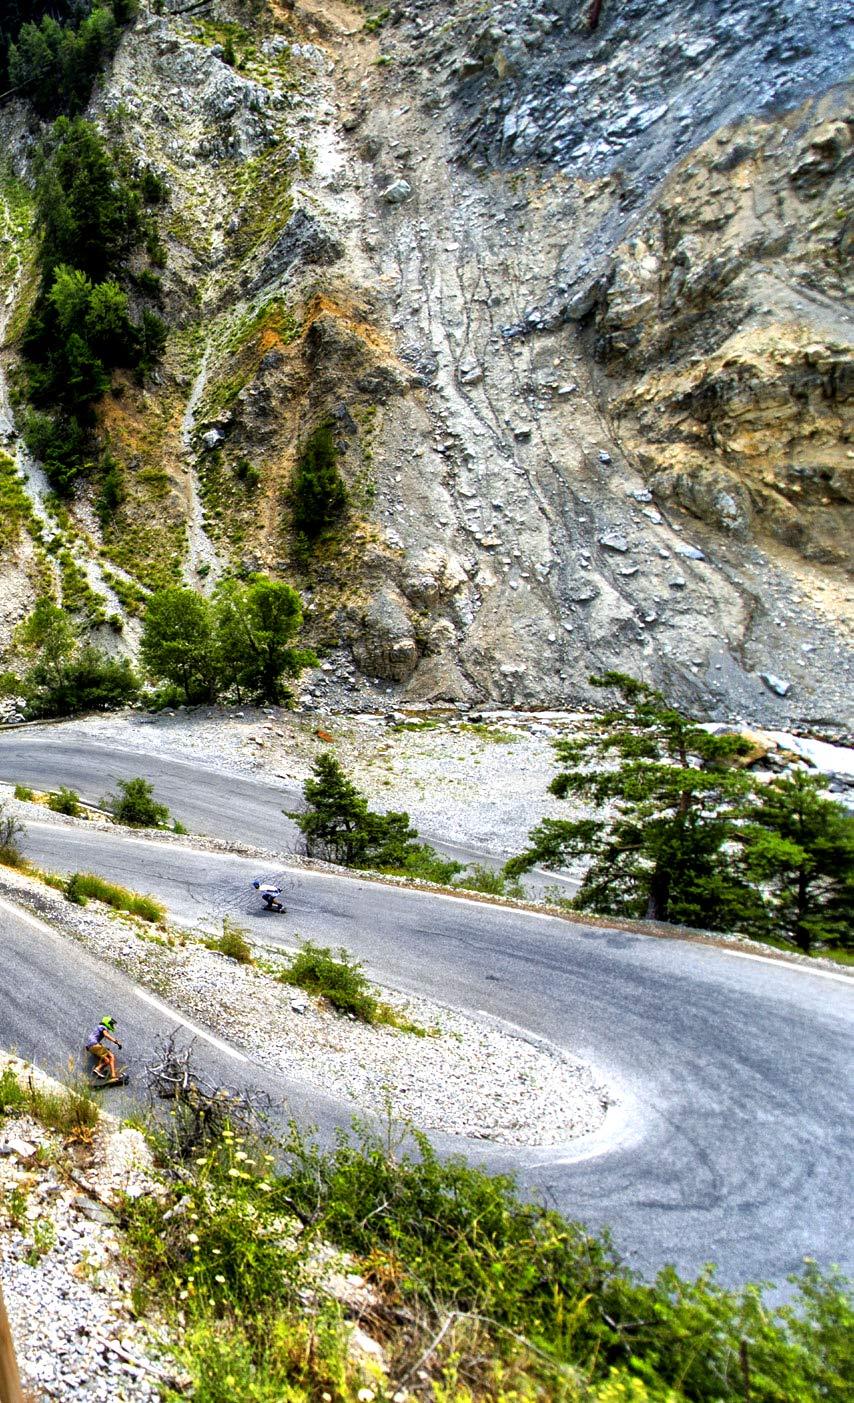 roadtrip-to-paradise-mountainside.jpg